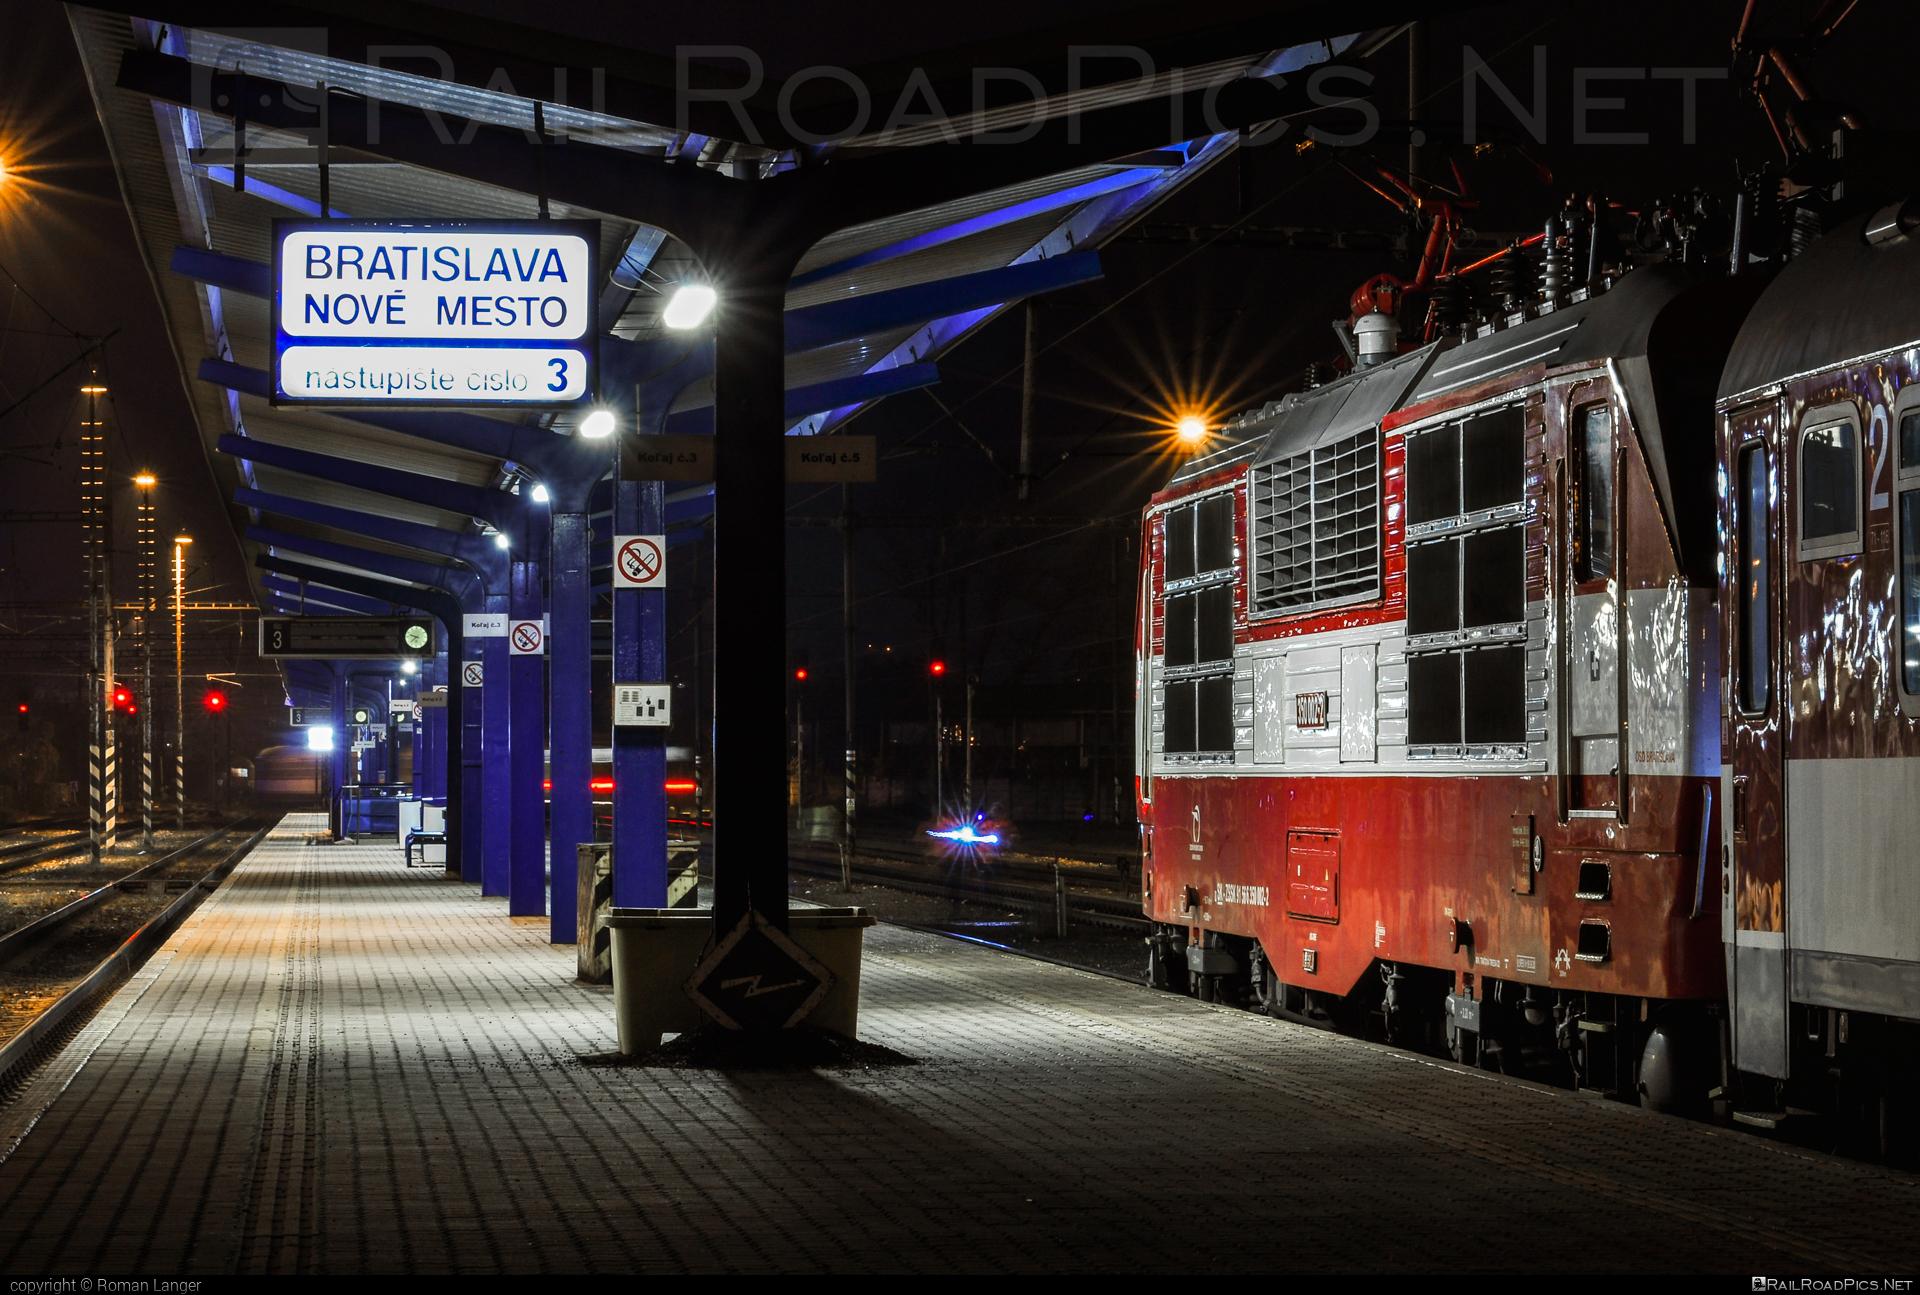 Škoda 55E - 350 002-2 operated by Železničná Spoločnost' Slovensko, a.s. #ZeleznicnaSpolocnostSlovensko #gorila #locomotive350 #skoda #skoda55e #zssk